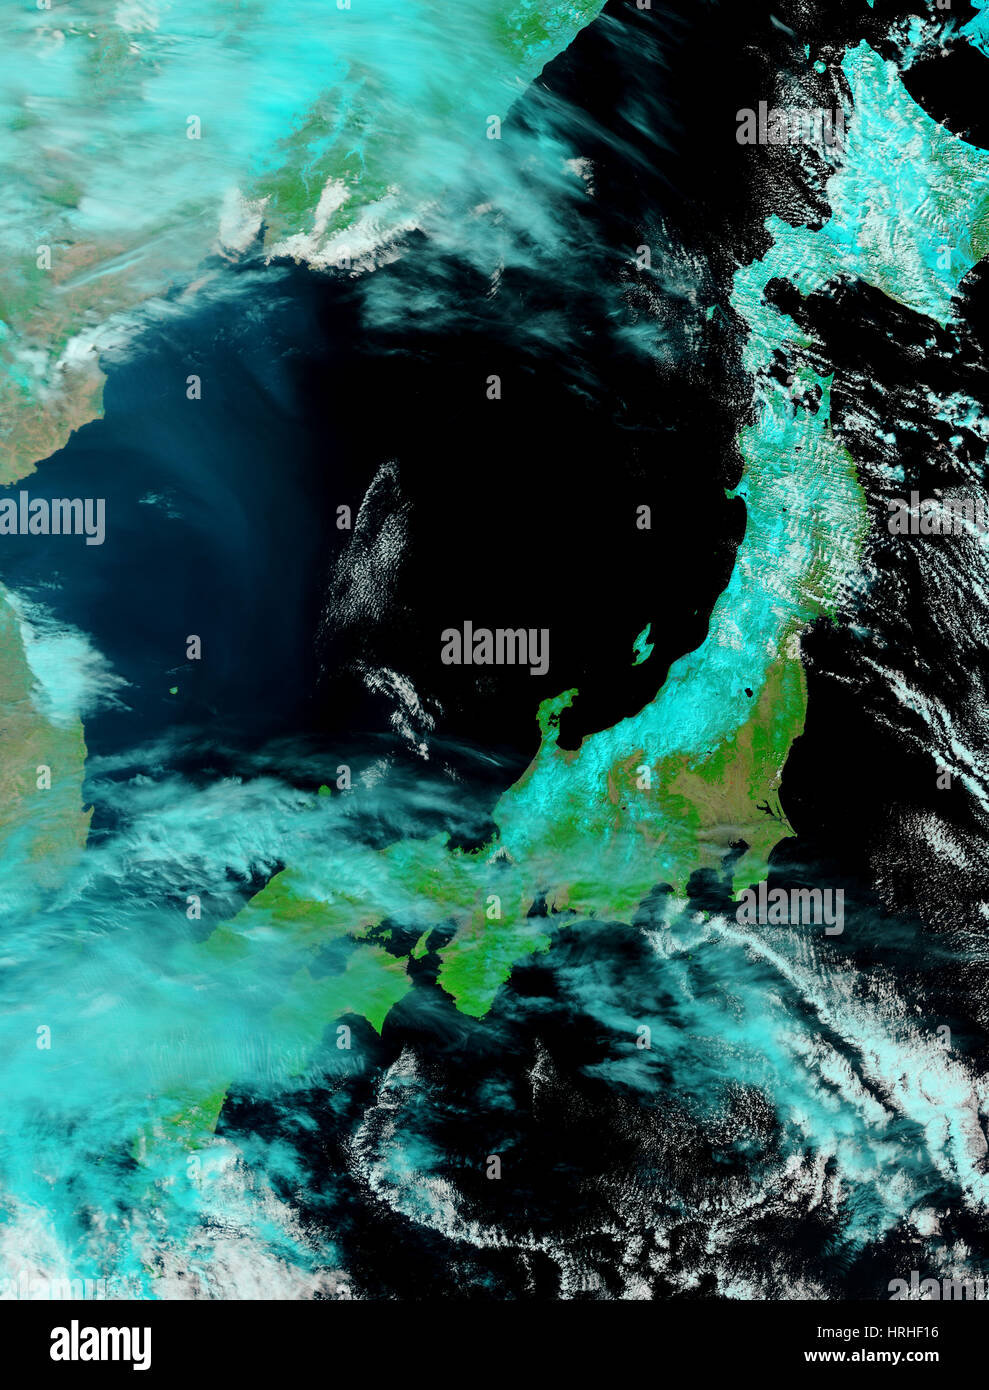 Northeastern Japan After Tsunami - Stock Image